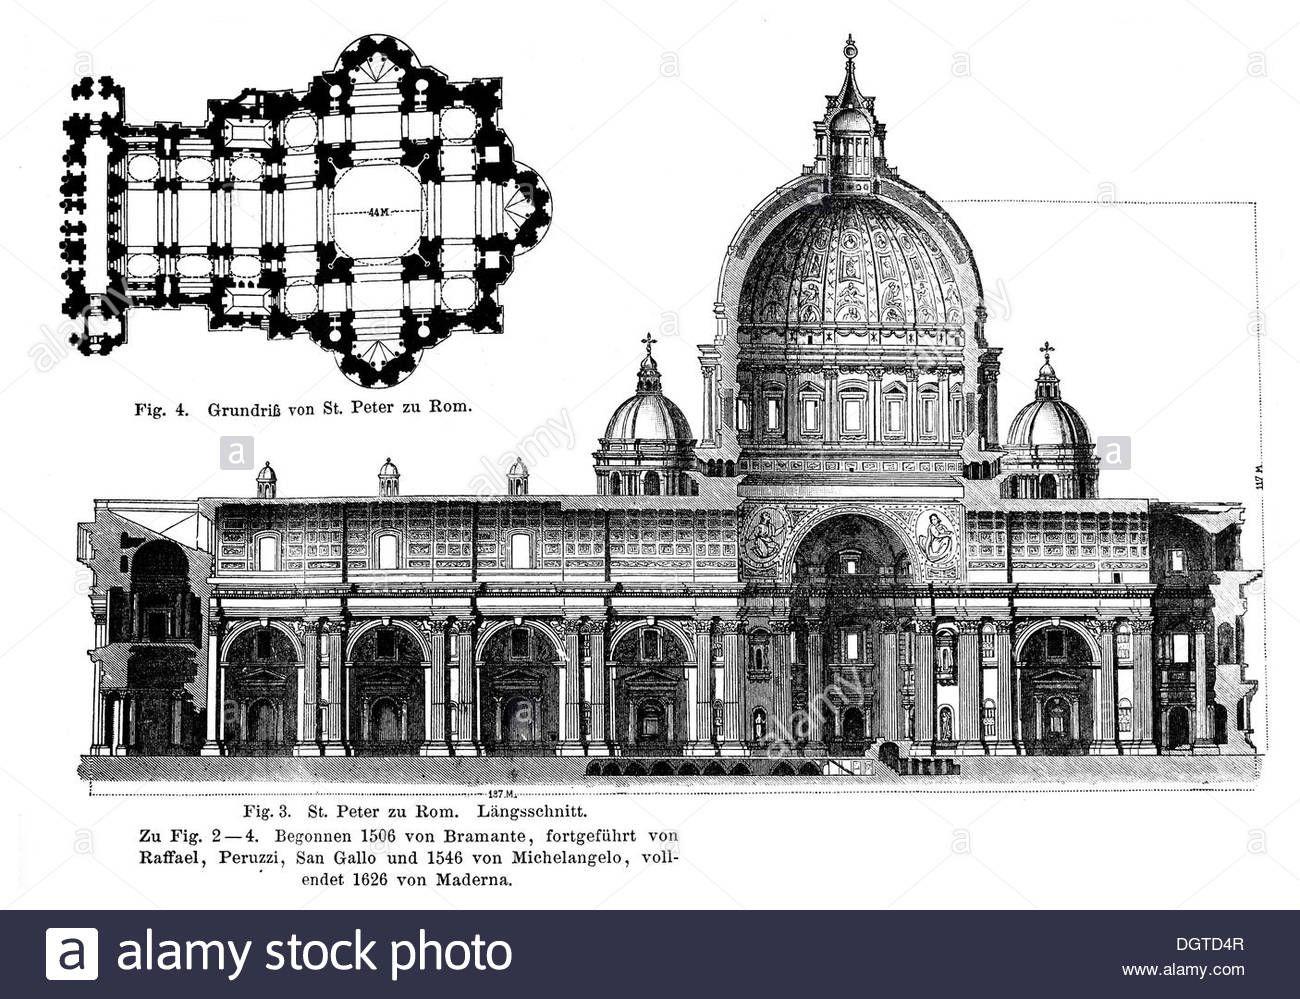 St. Peter's Basilica, Rome, Longitudinal Section